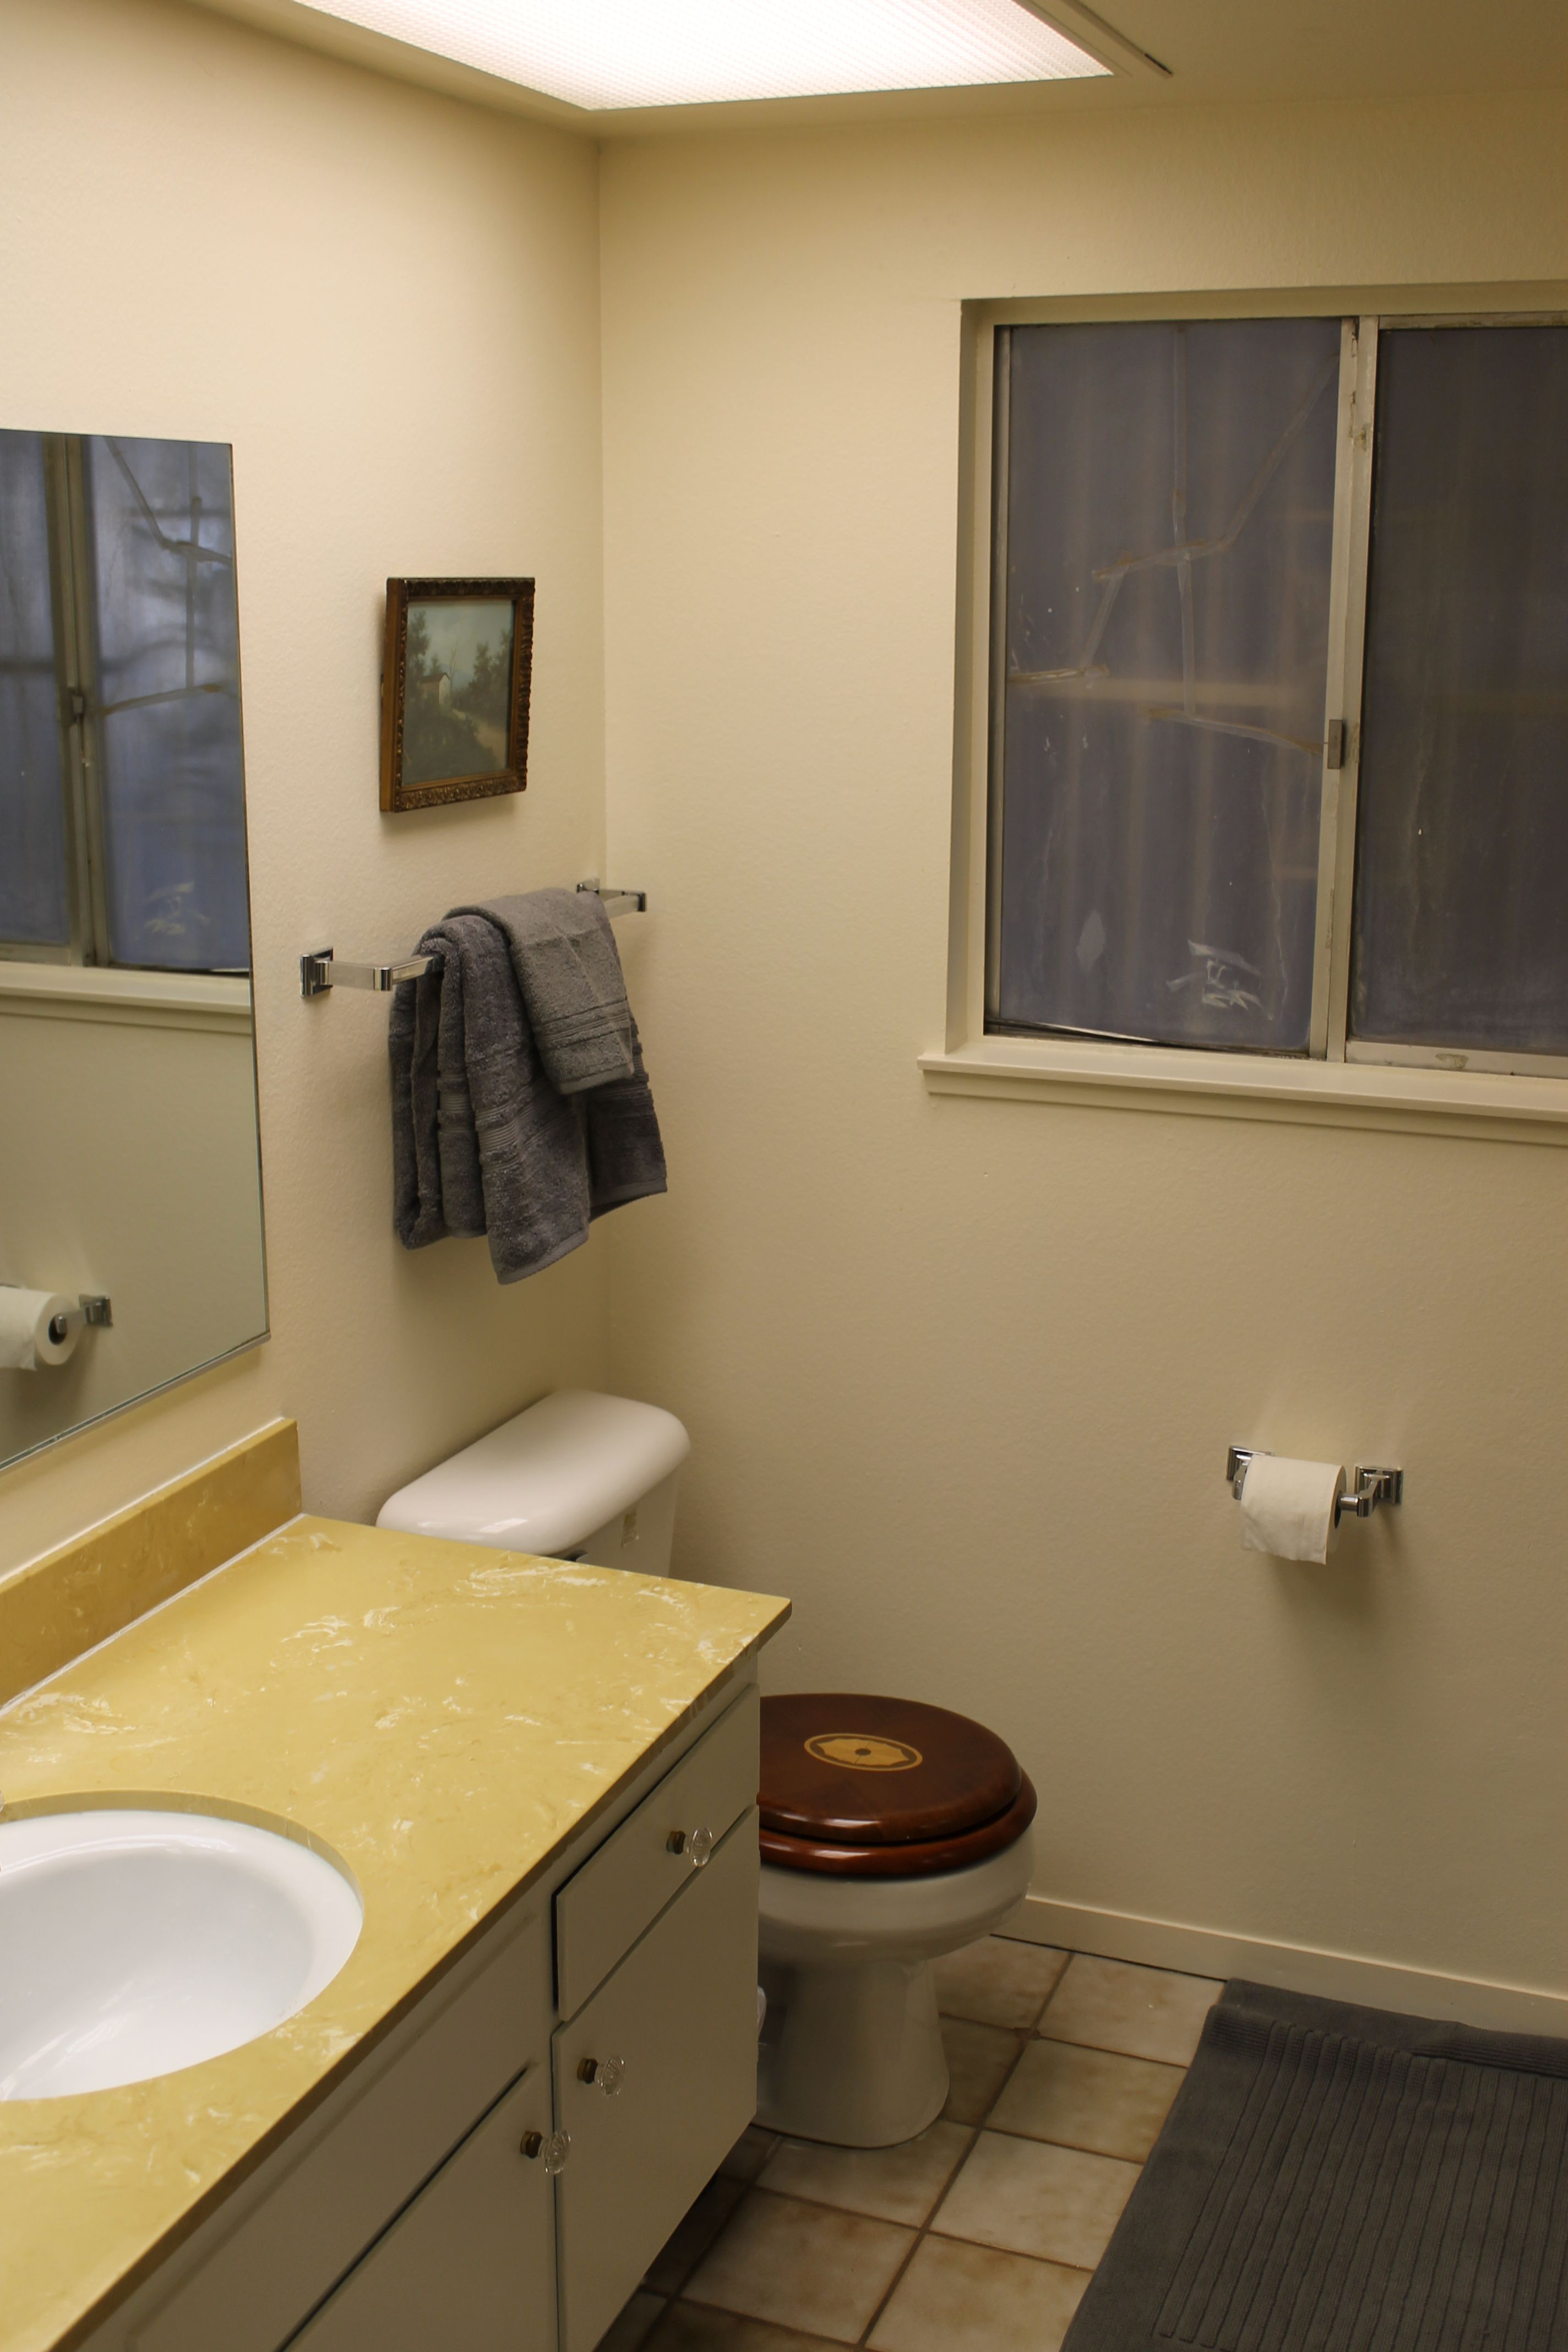 West-bathroom-compressor